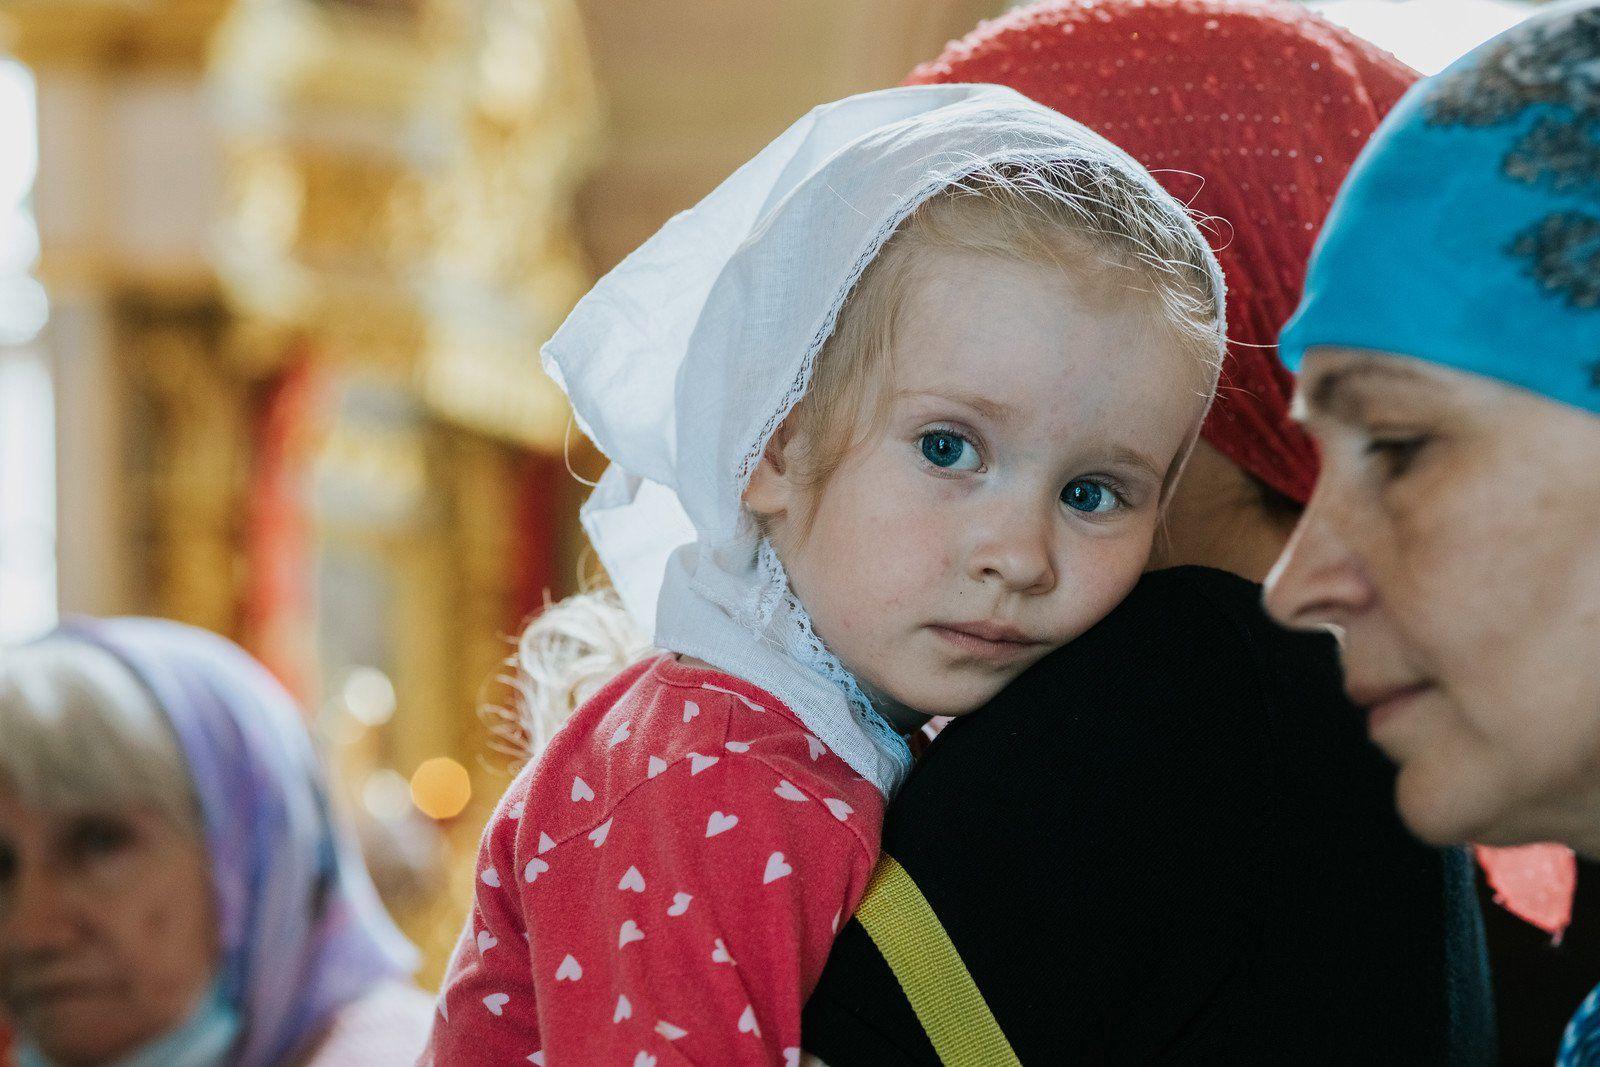 220 лет со дня освящения Троицкого храма в Дмитрове3